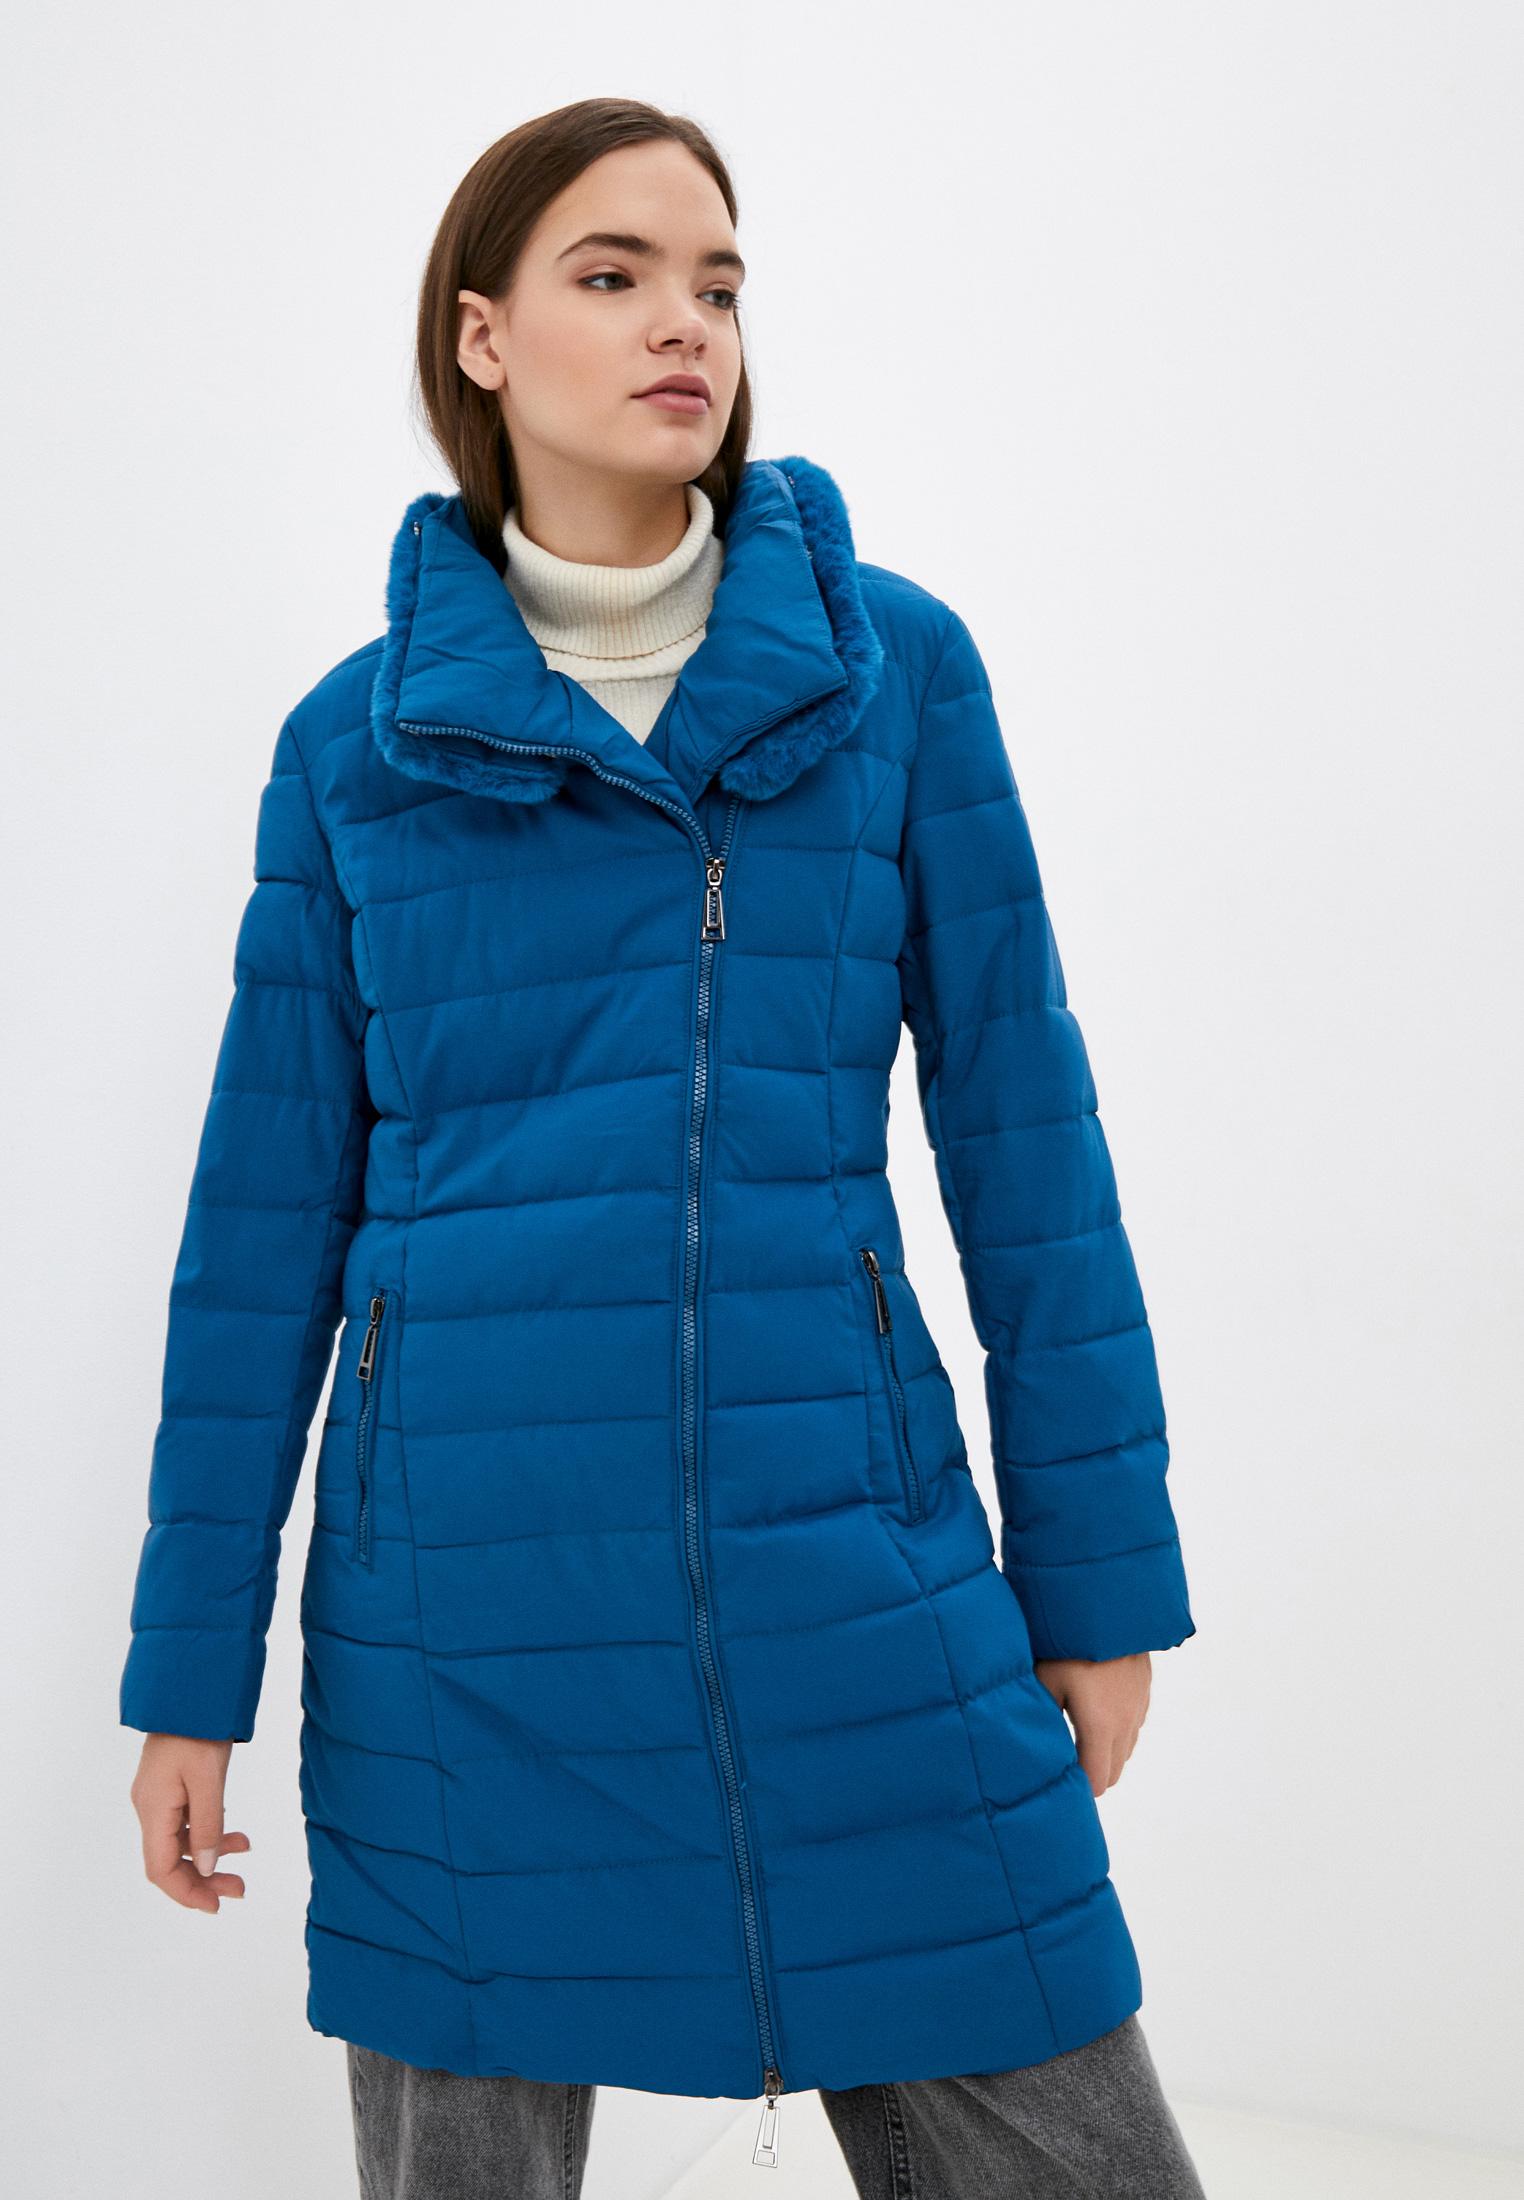 Утепленная куртка Adrixx Куртка утепленная Adrixx